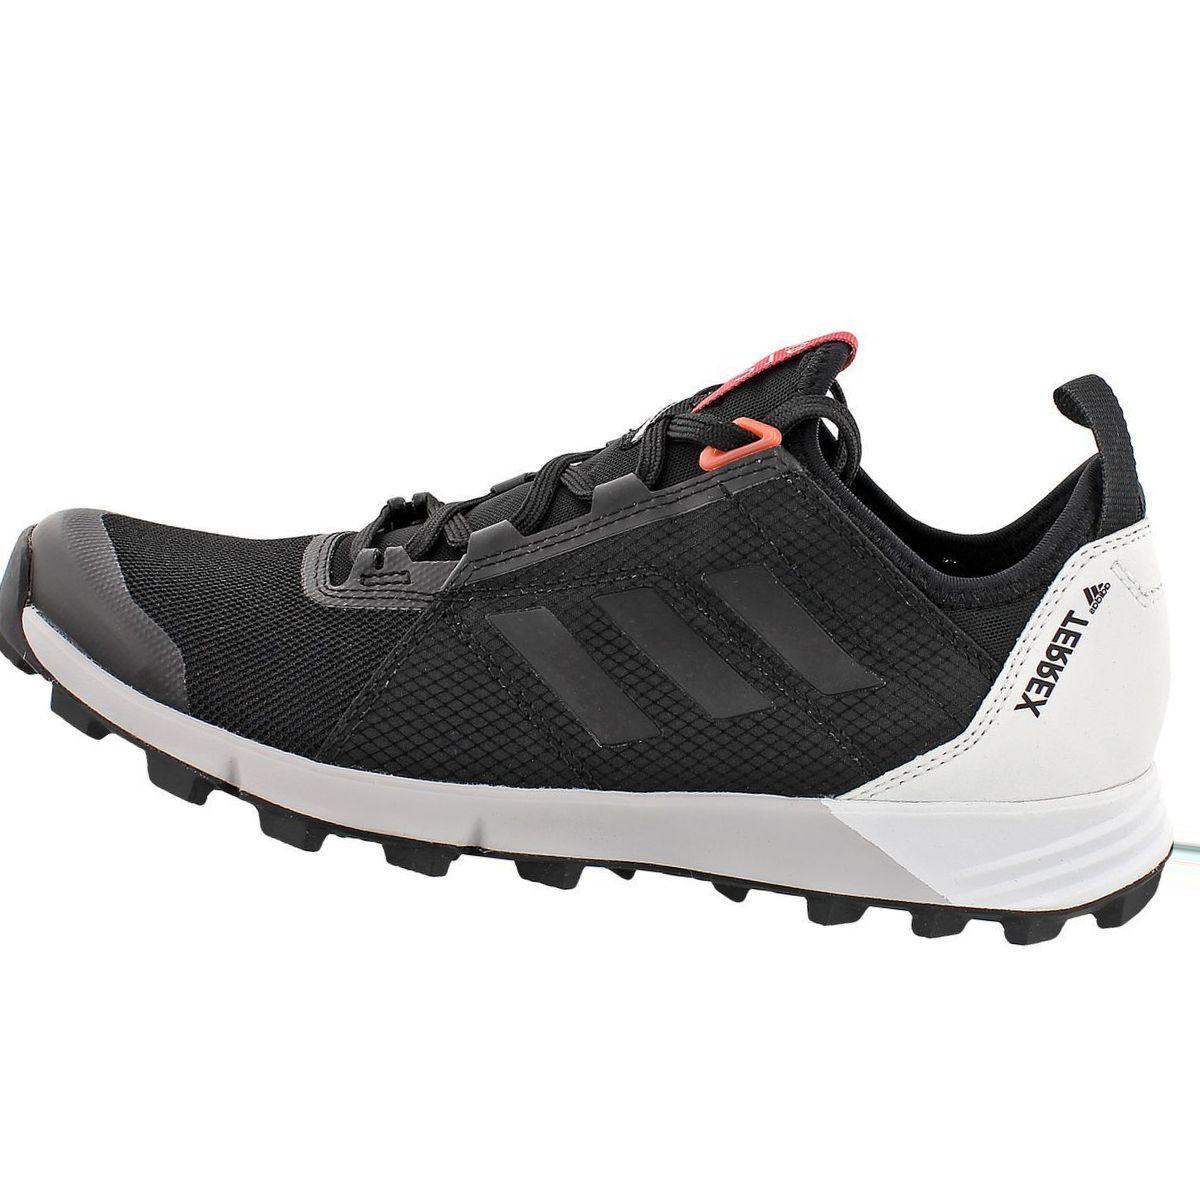 Adidas Outdoor Terrex Agravic Speed Trail Running Shoe - Women's